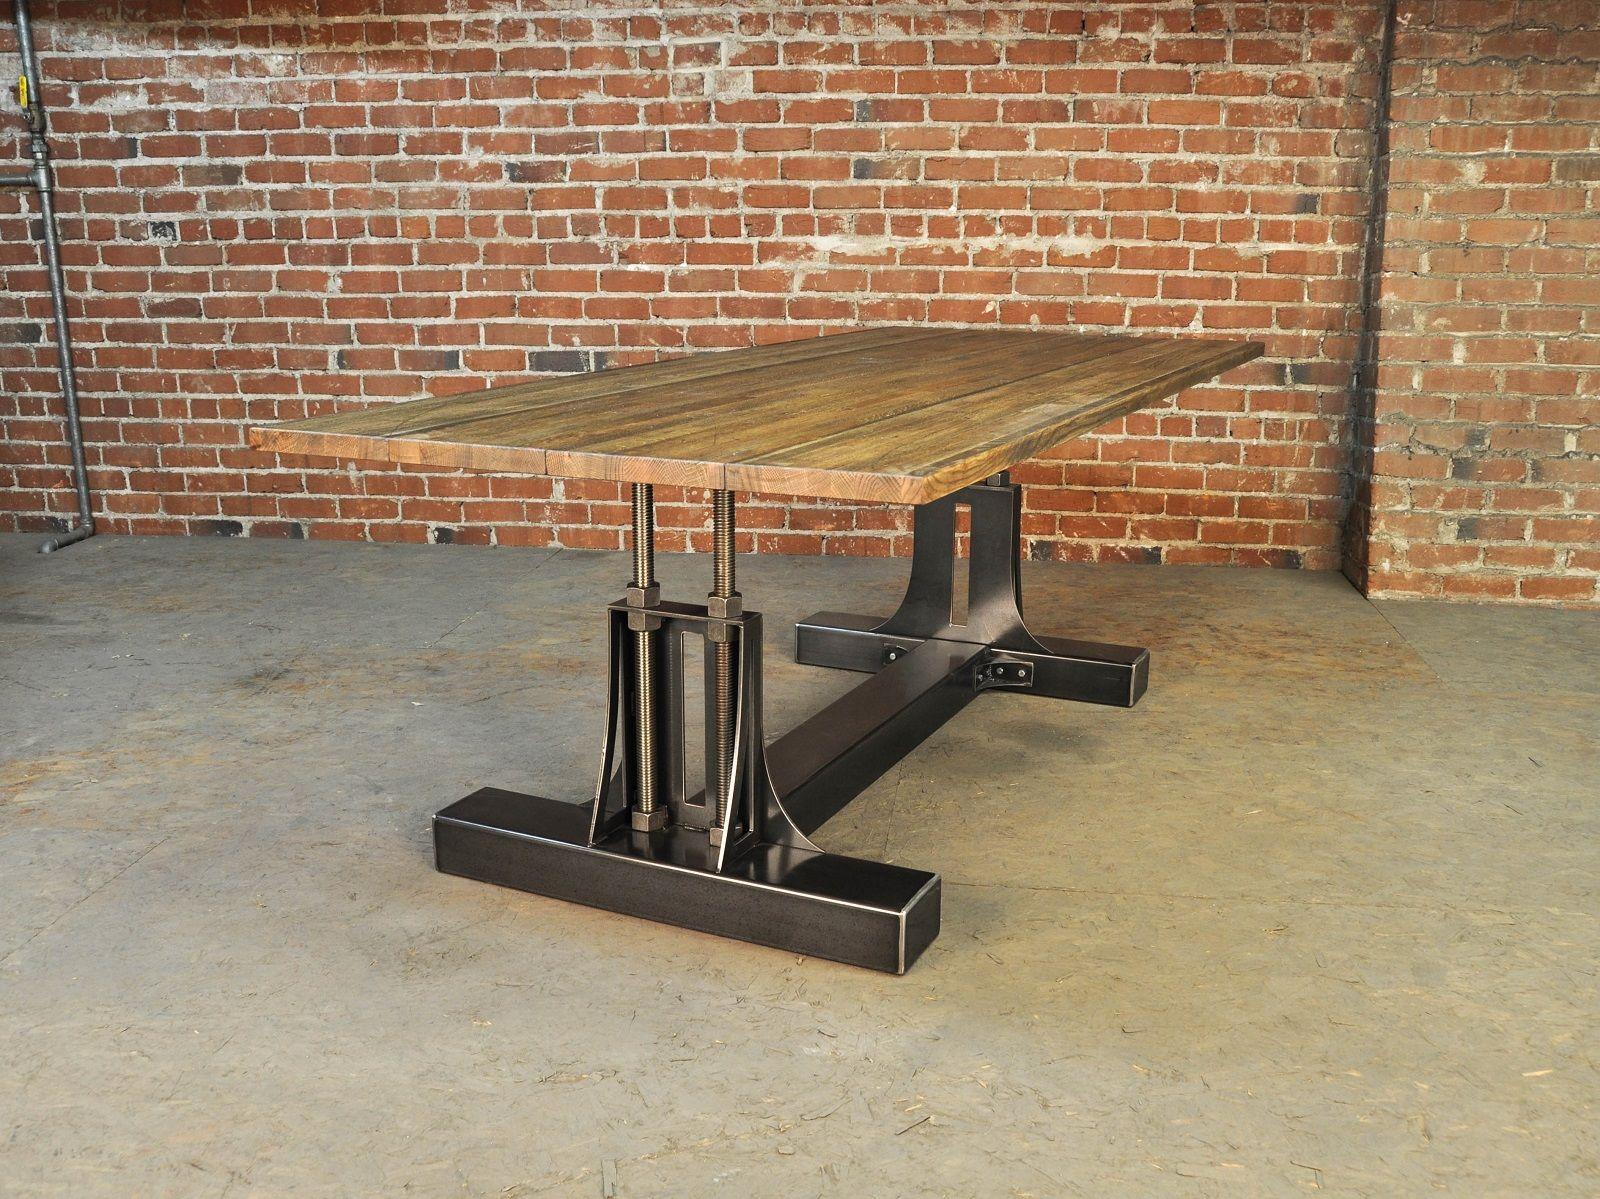 Bureau Metallique Industriel Vintage post industrial table | ameublement industriel vintage